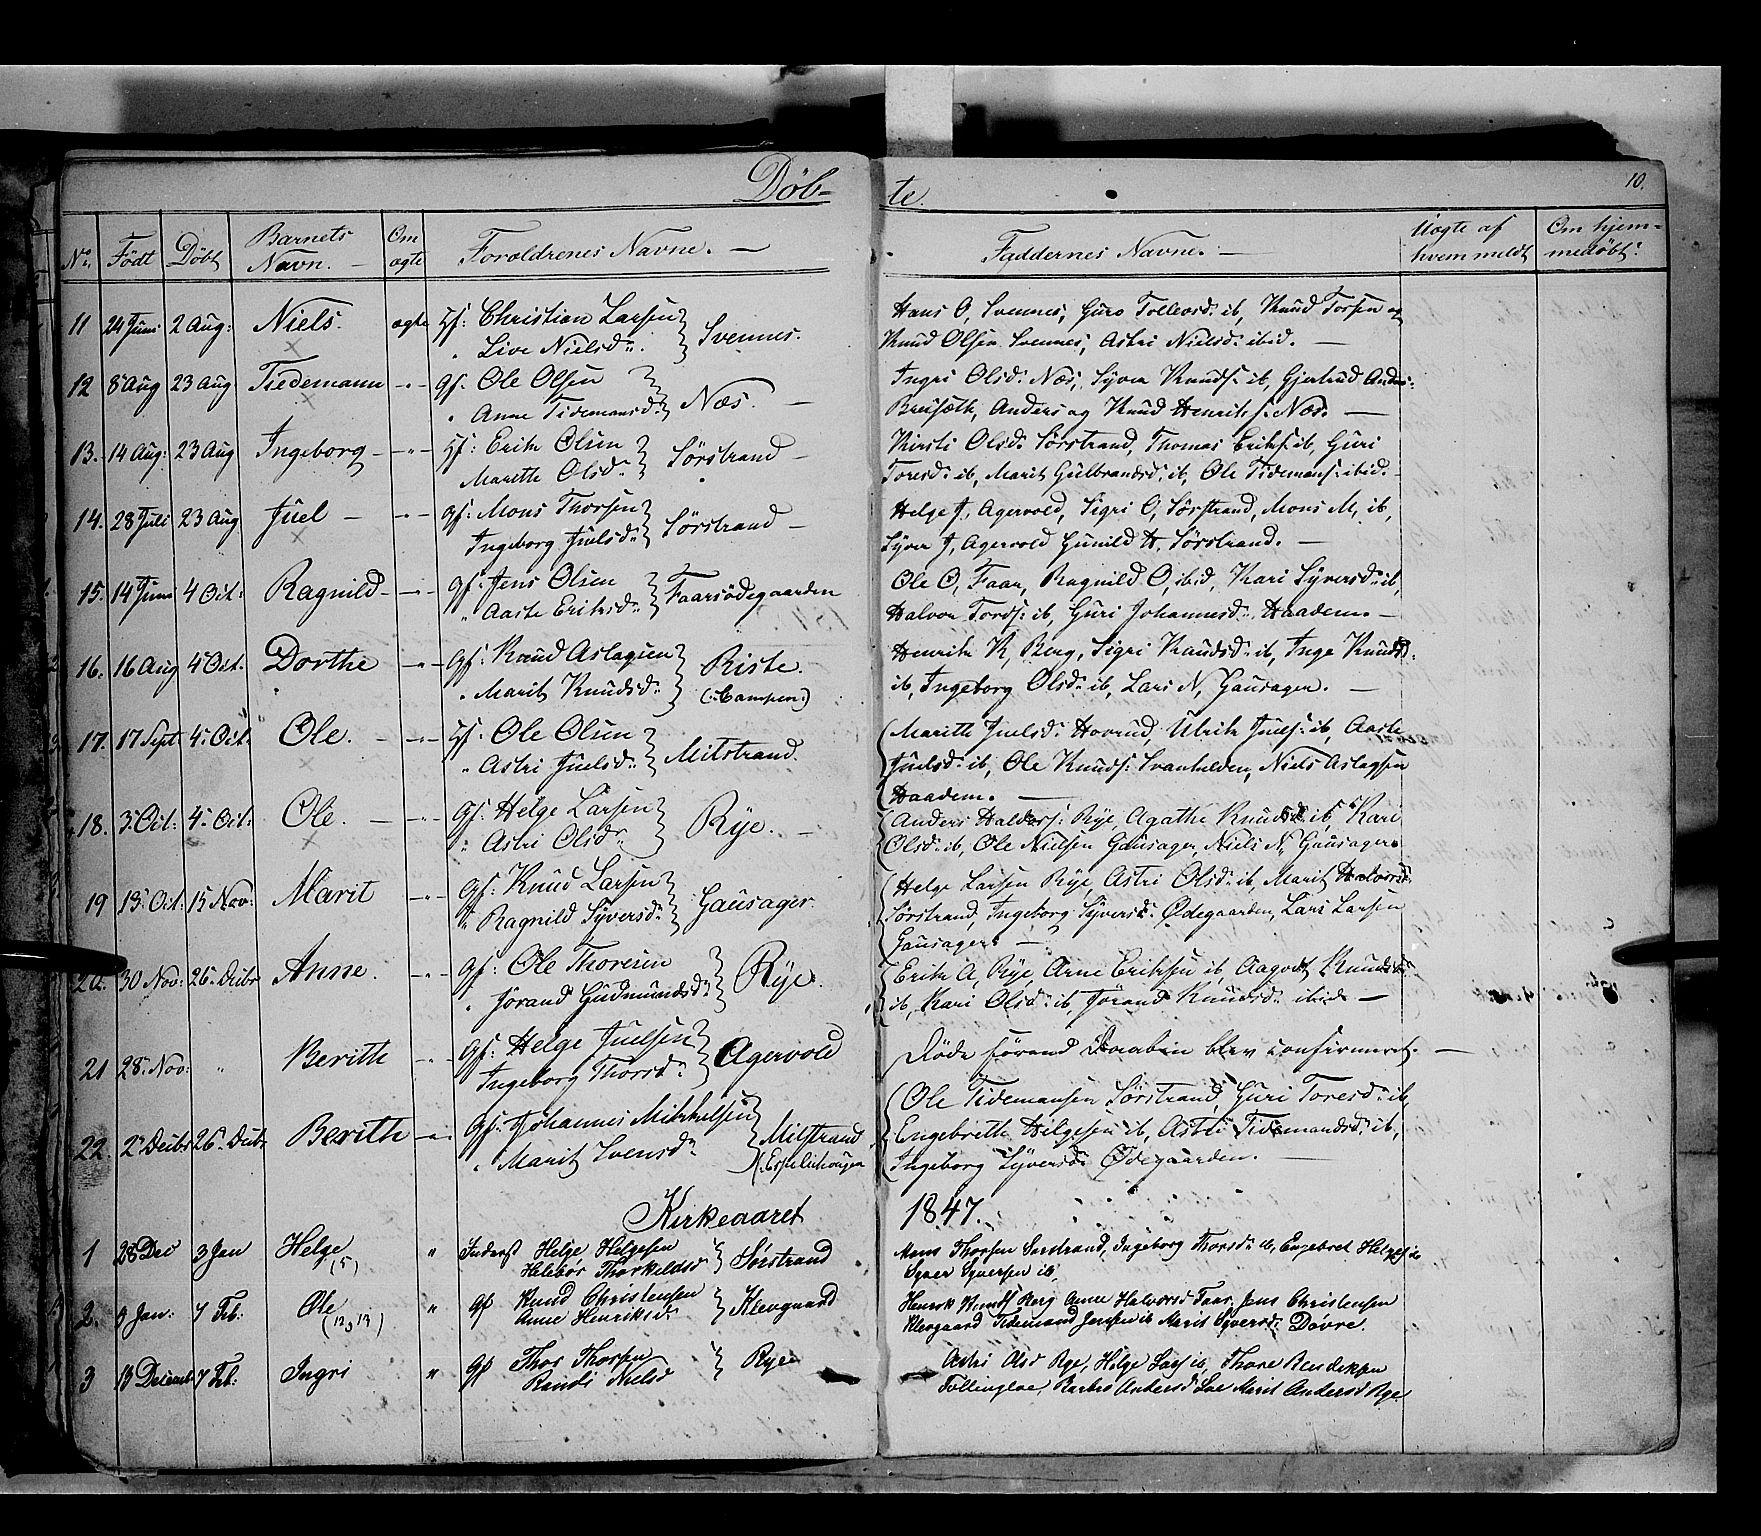 SAH, Nord-Aurdal prestekontor, Ministerialbok nr. 5, 1842-1863, s. 10